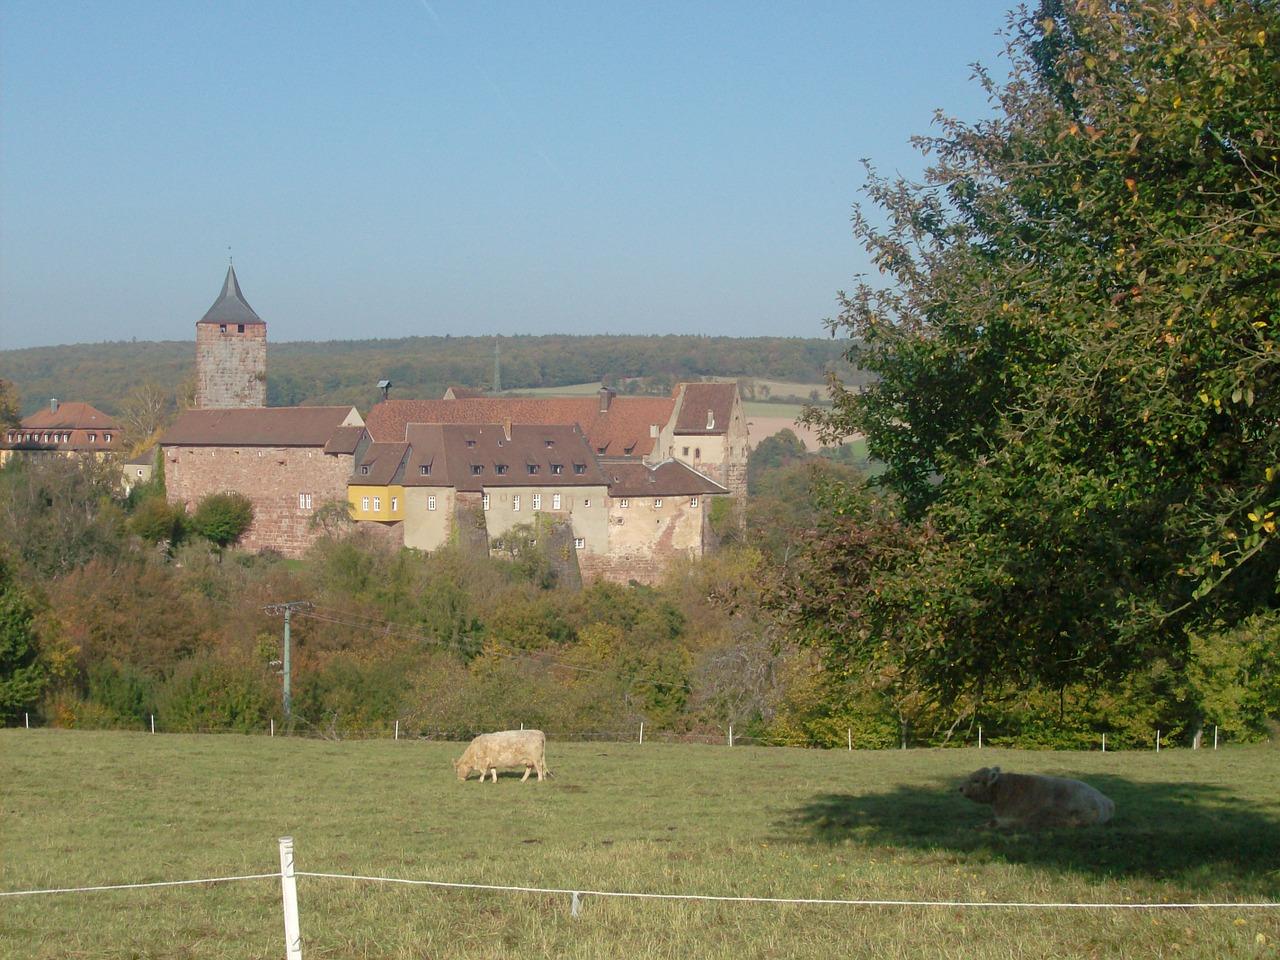 Rothenfels